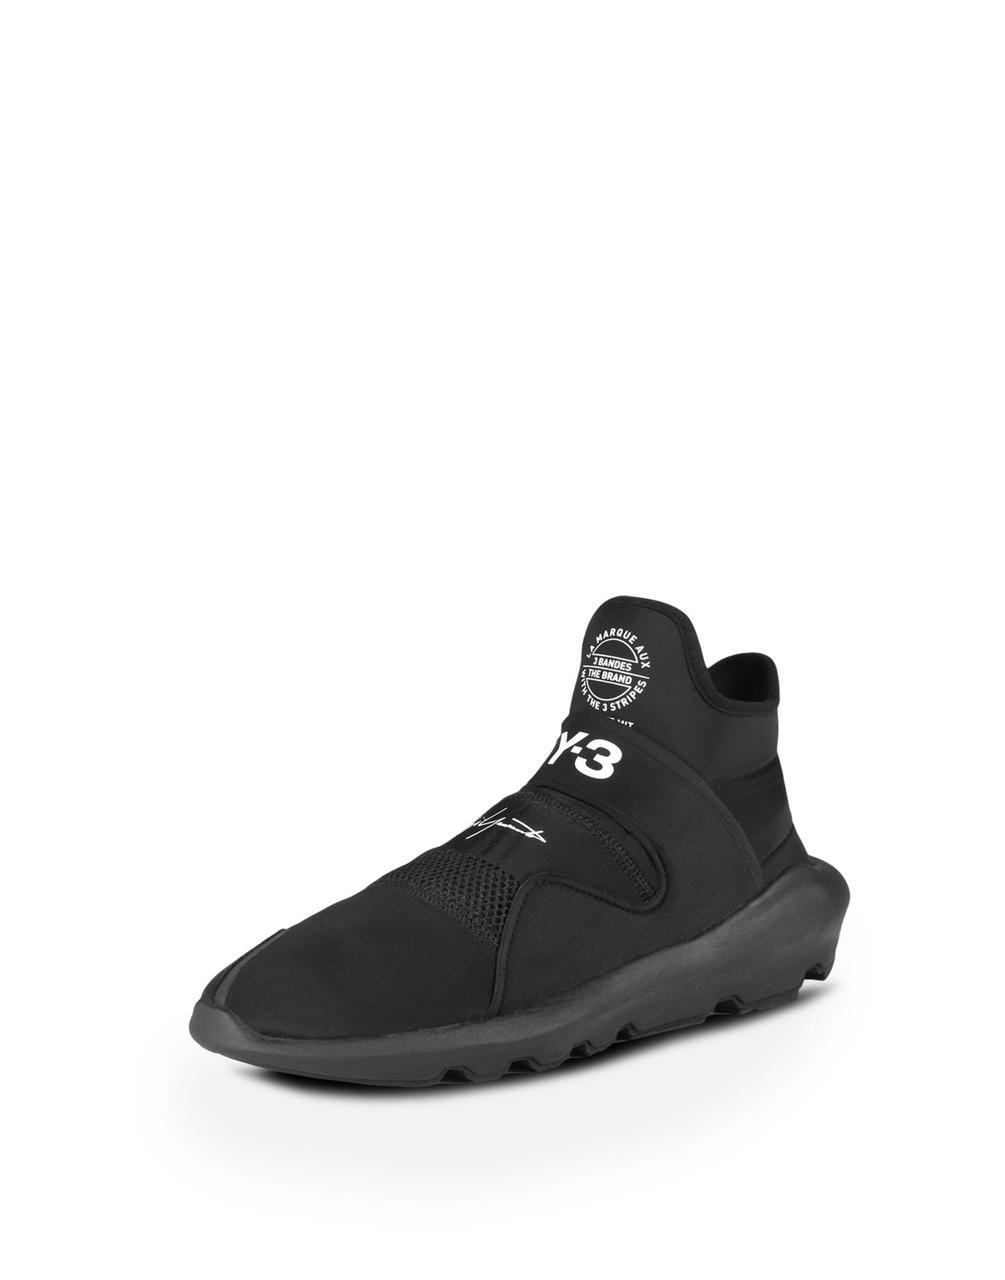 Кроссовки мужские  Adidas YAMAMOTO Y-3 SUBEROU All Black